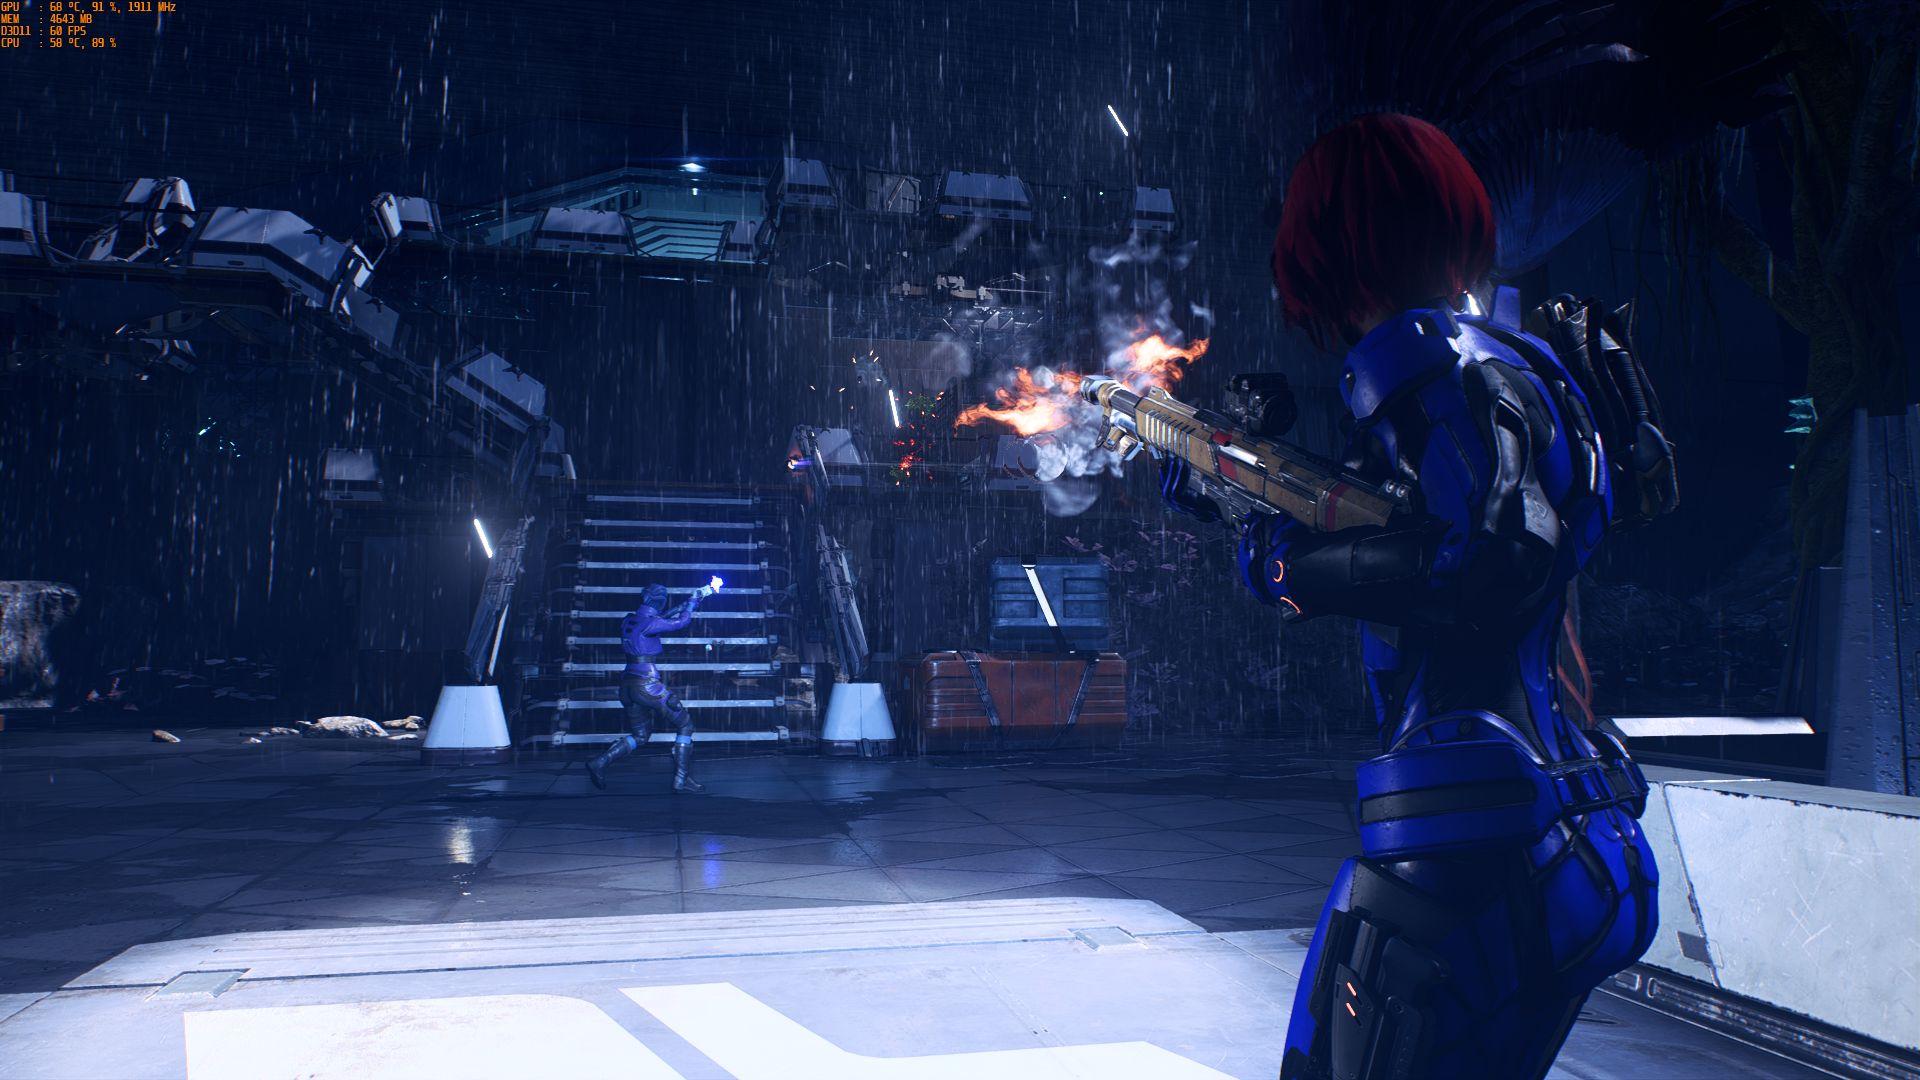 Mass Effect Andromeda Screenshot 2017.07.23 - 17.16.00.23.jpg - Mass Effect: Andromeda